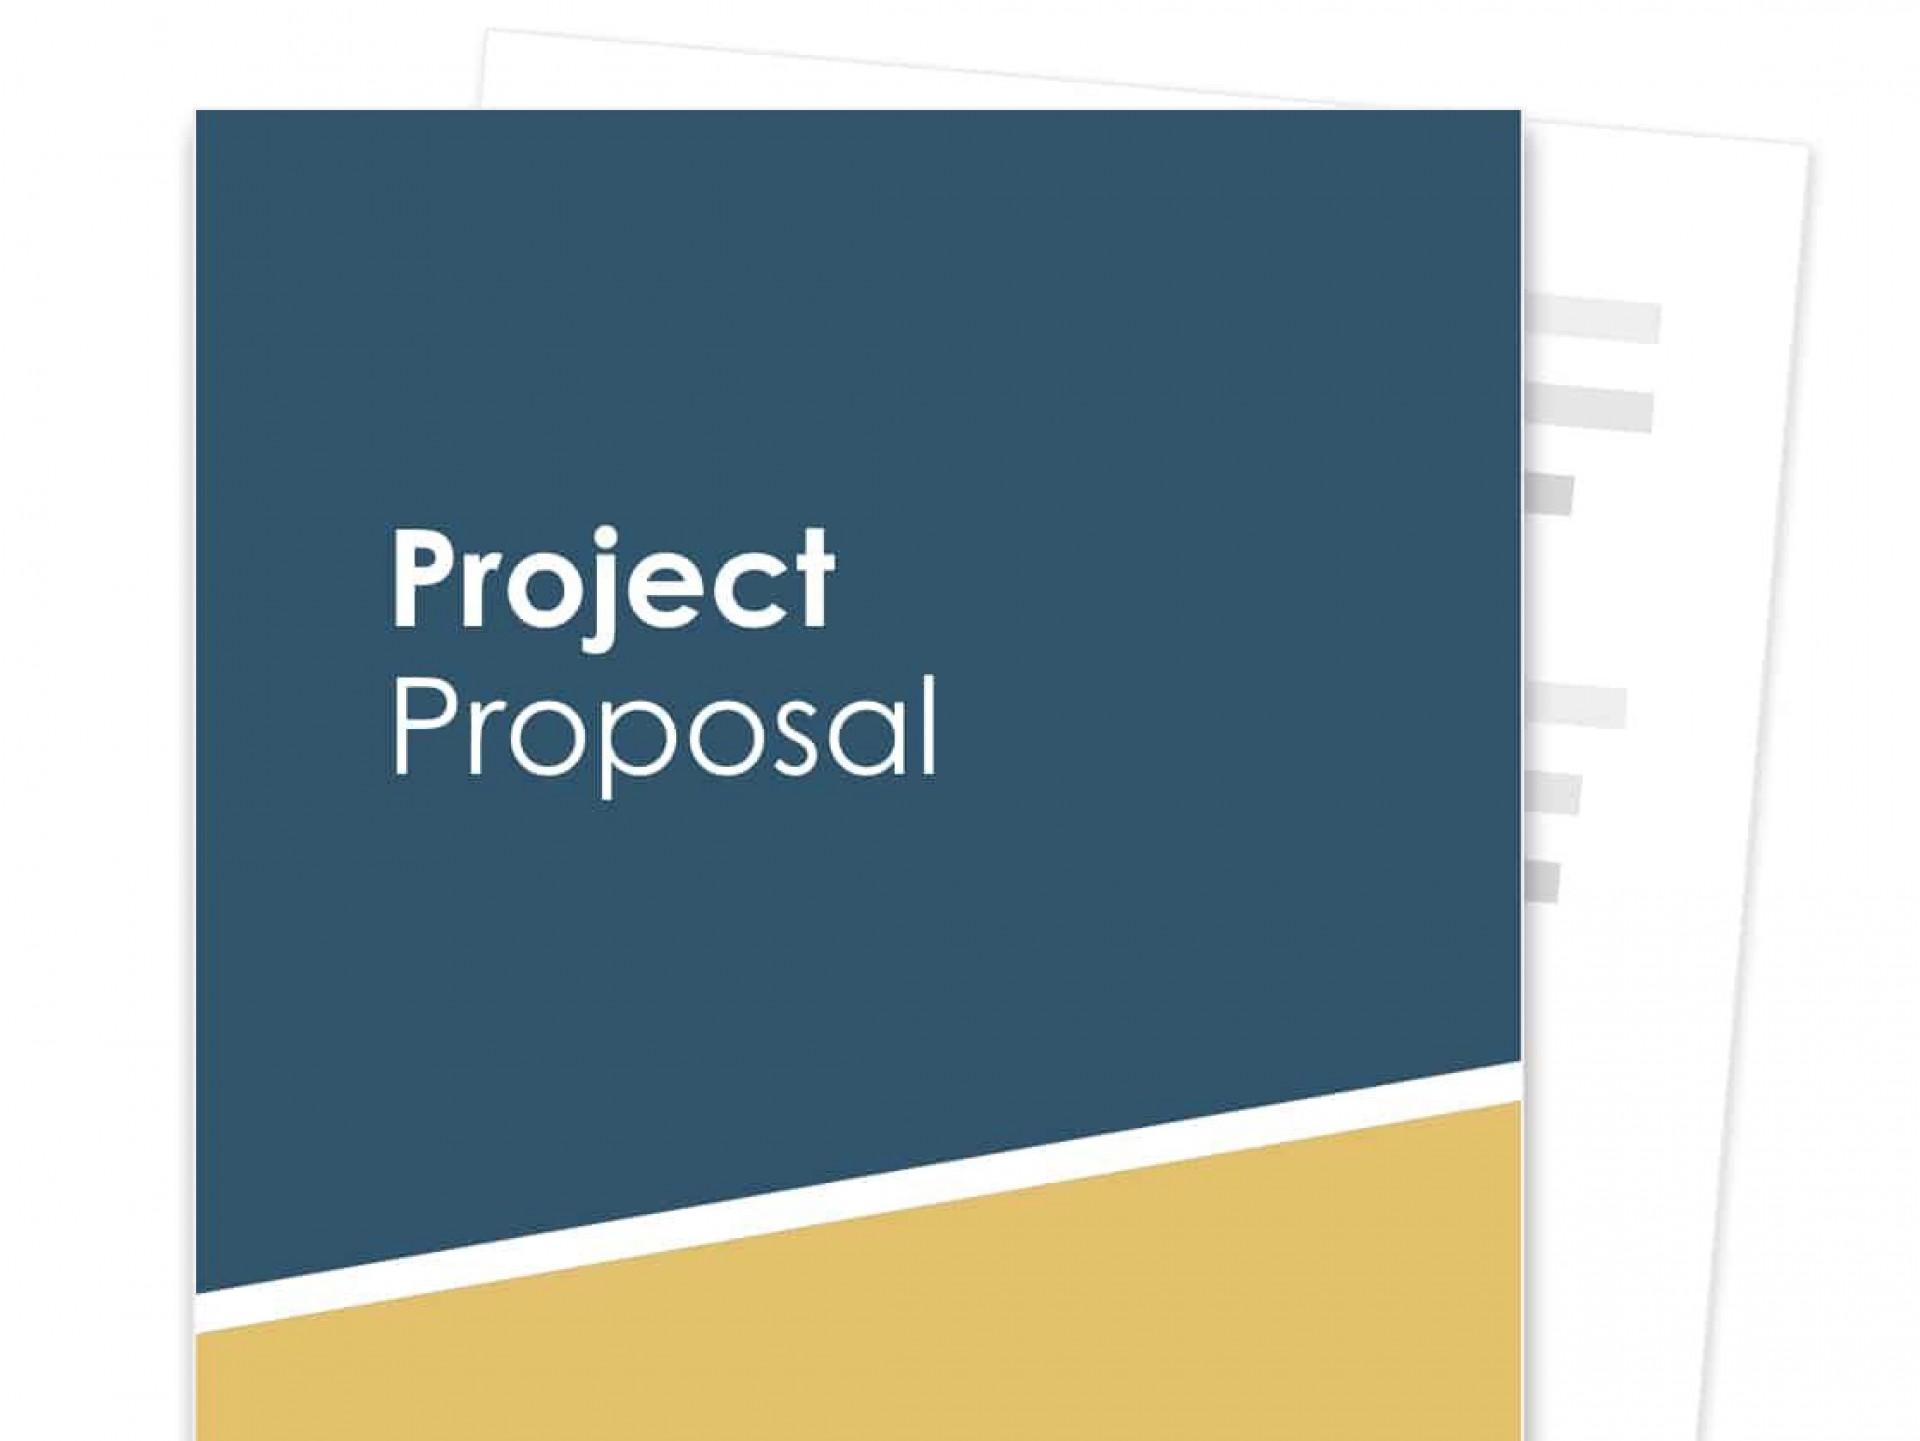 007 Impressive Website Development Proposal Template Free Image  Word1920